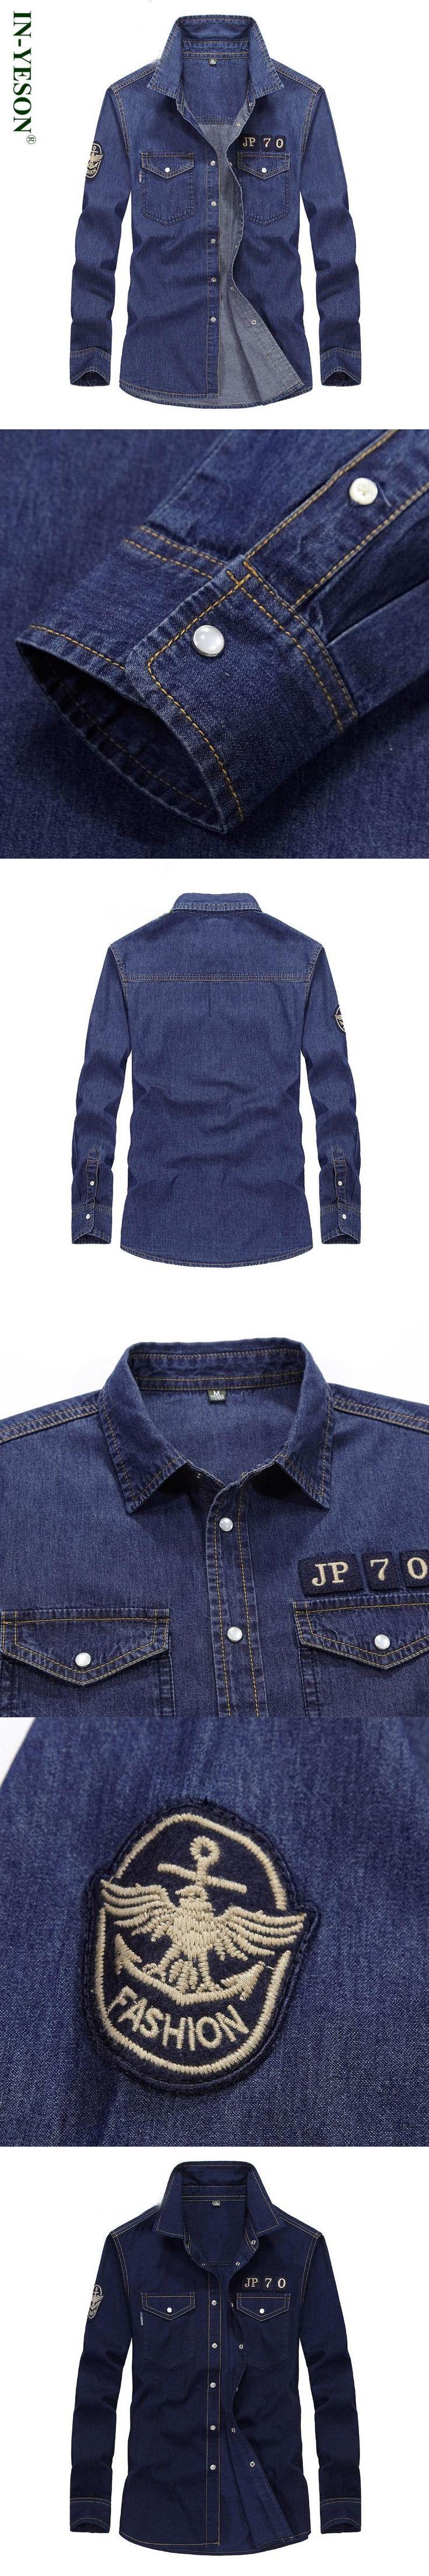 IN-YESON long sleeve shirt men brand denim shirt men European & American style mens jeans shirt casual dress shirt camisas